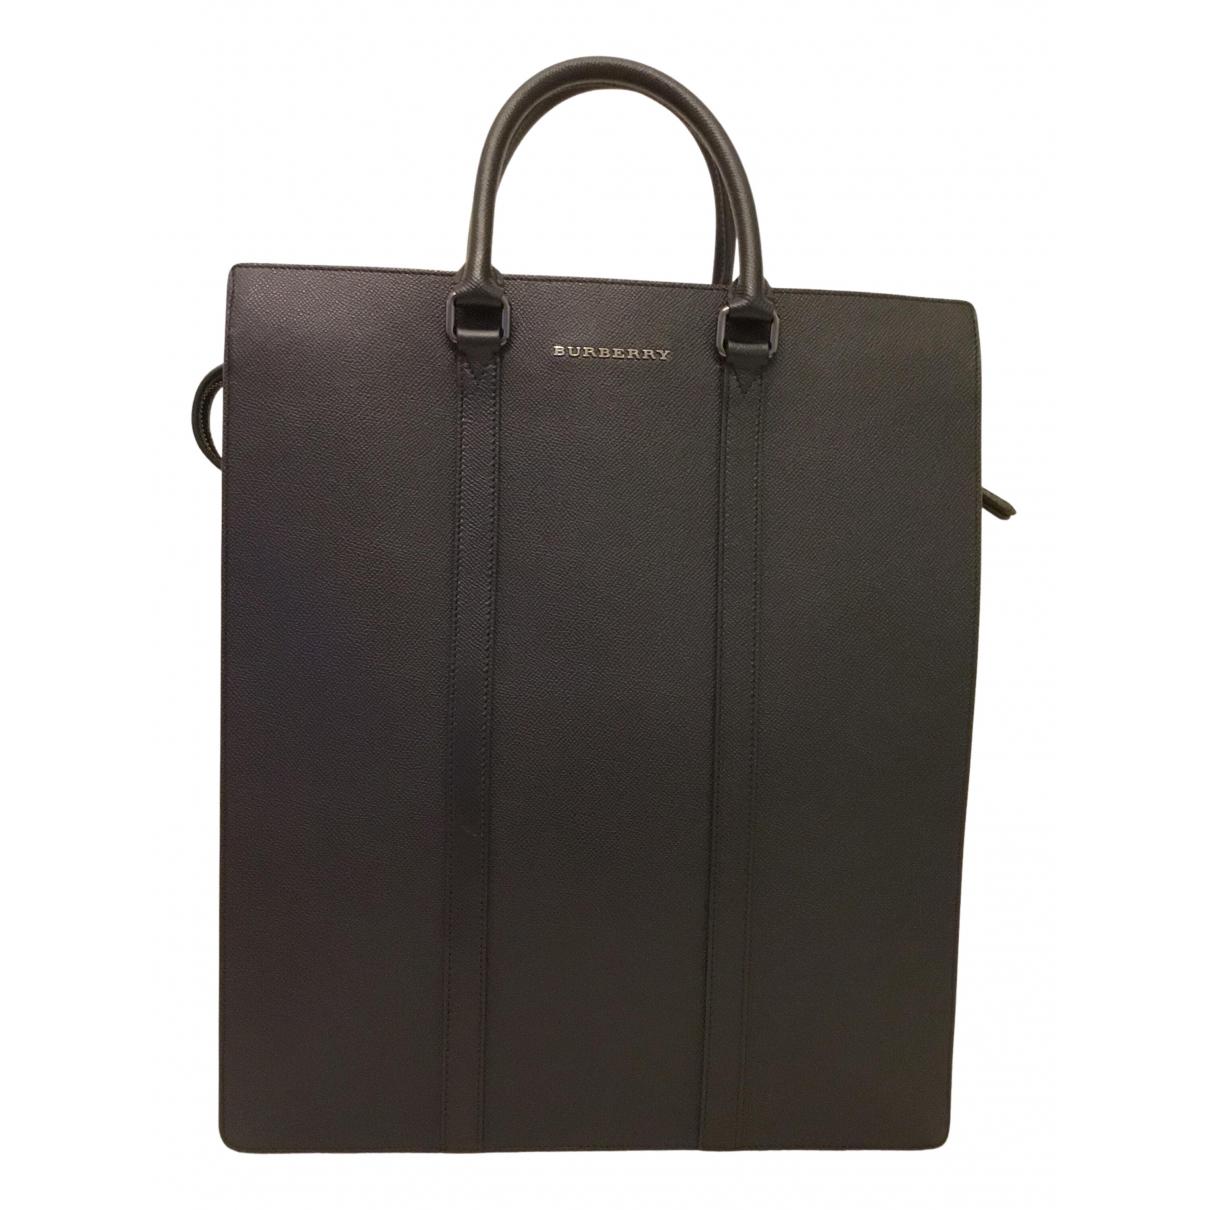 Burberry N Black Leather bag for Men N